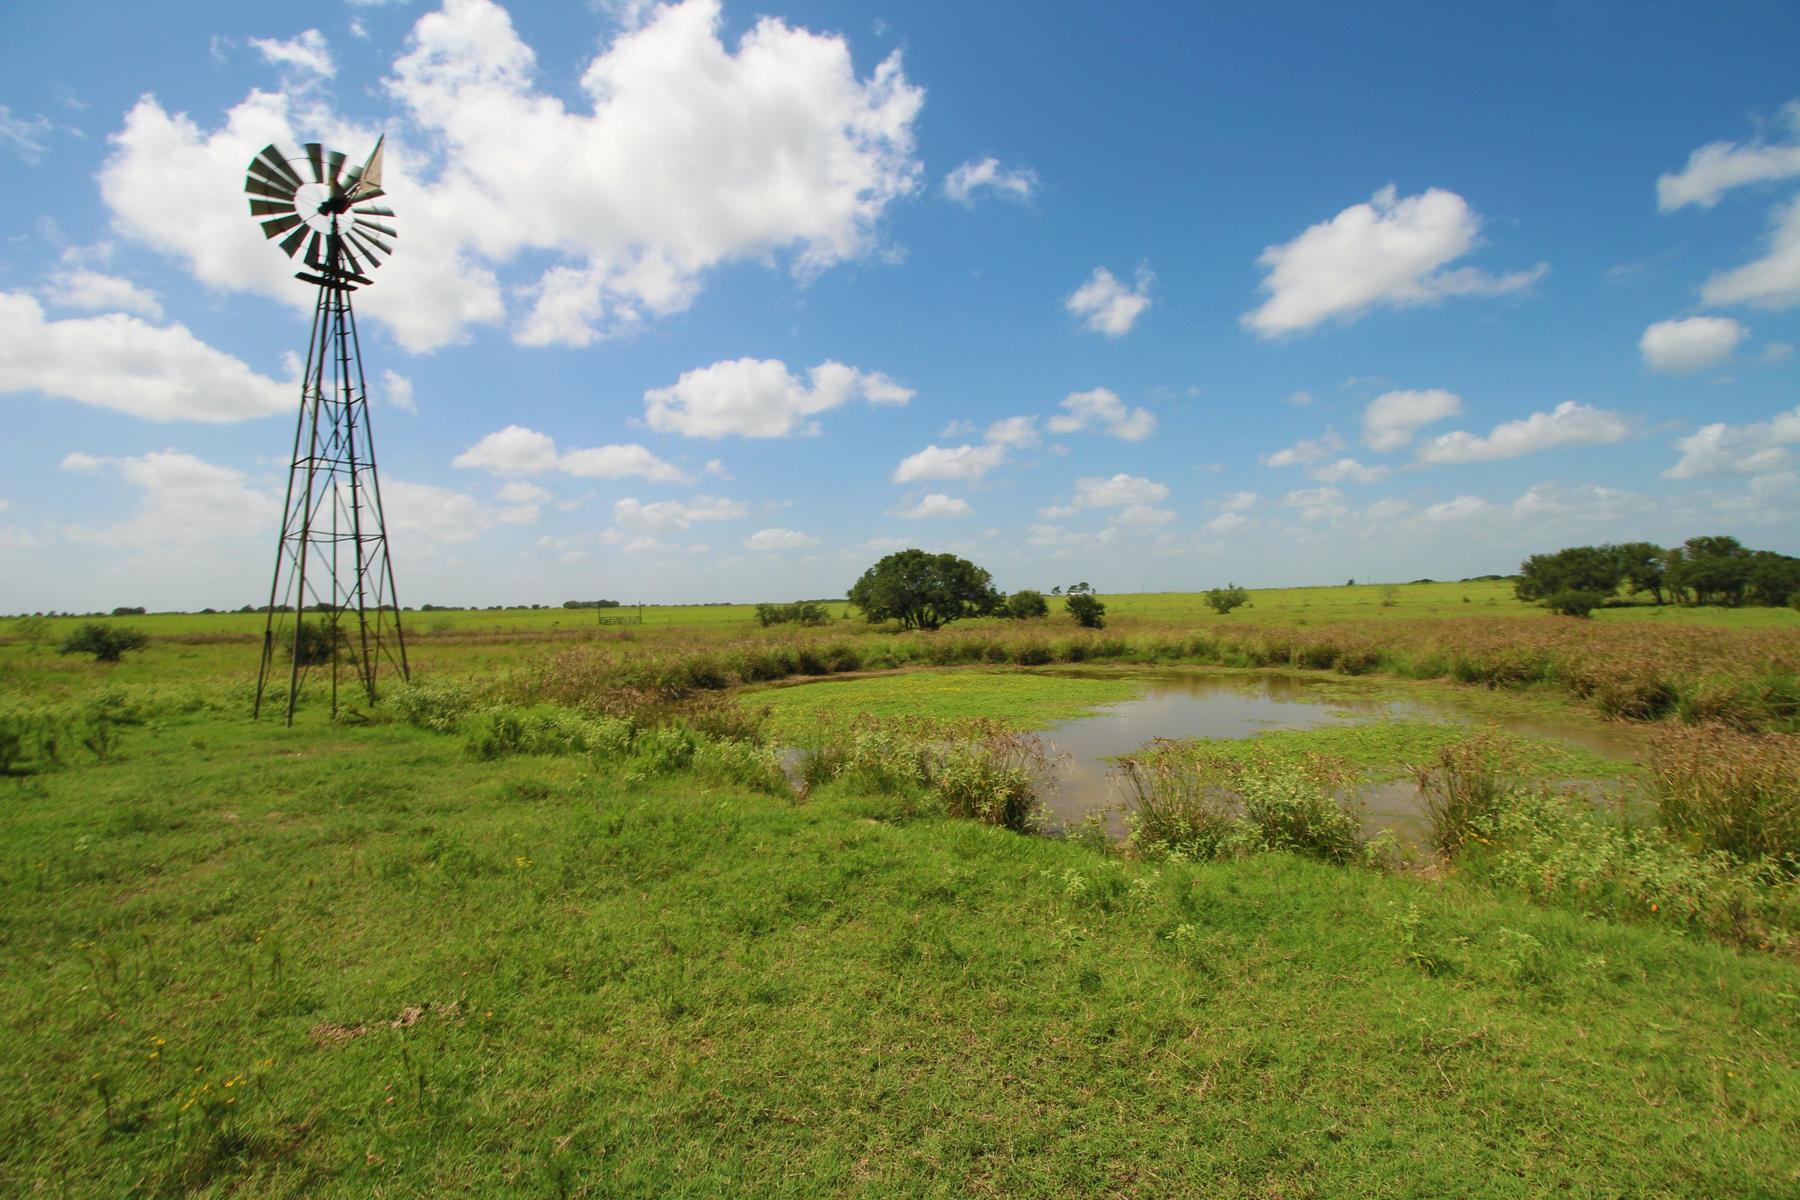 Farm / Ranch / Plantation for Sale at 894+- Acrew Tri-County Ranch 894+- AC Tri-County Ranch ou Victoria, Texas 77901 United States